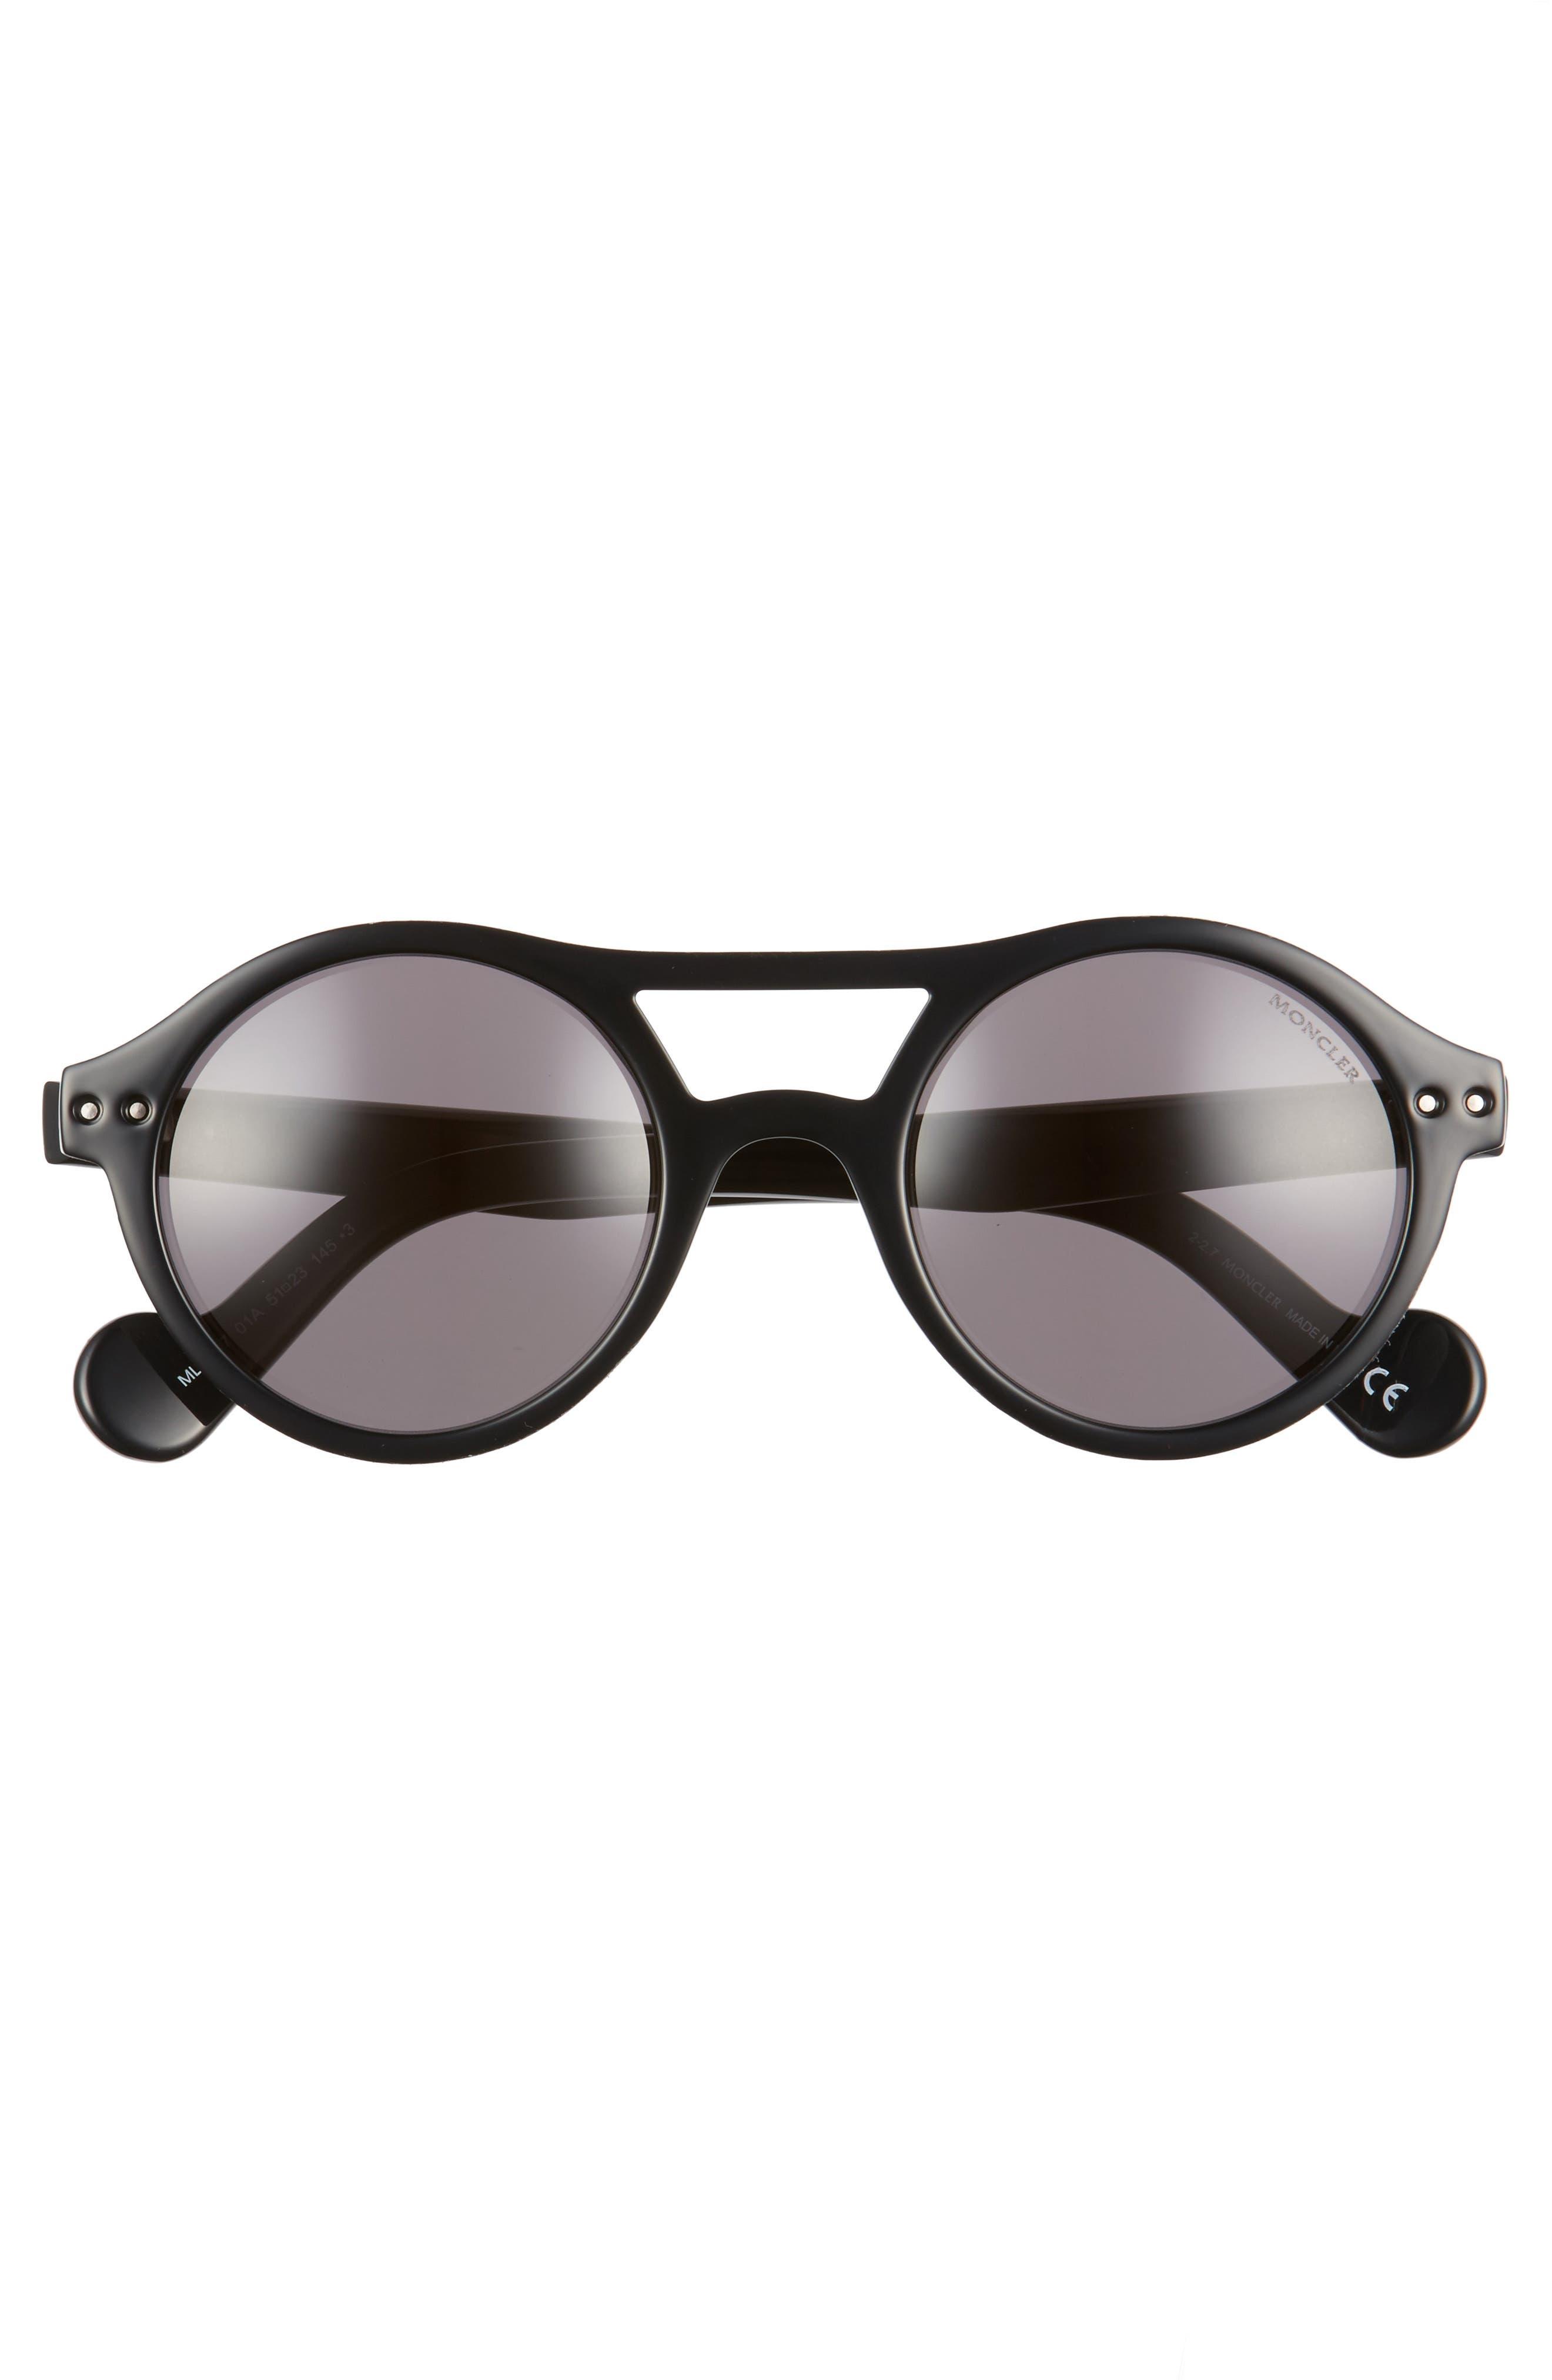 51mm Round Sunglasses,                             Alternate thumbnail 3, color,                             BLACK/ SMOKE